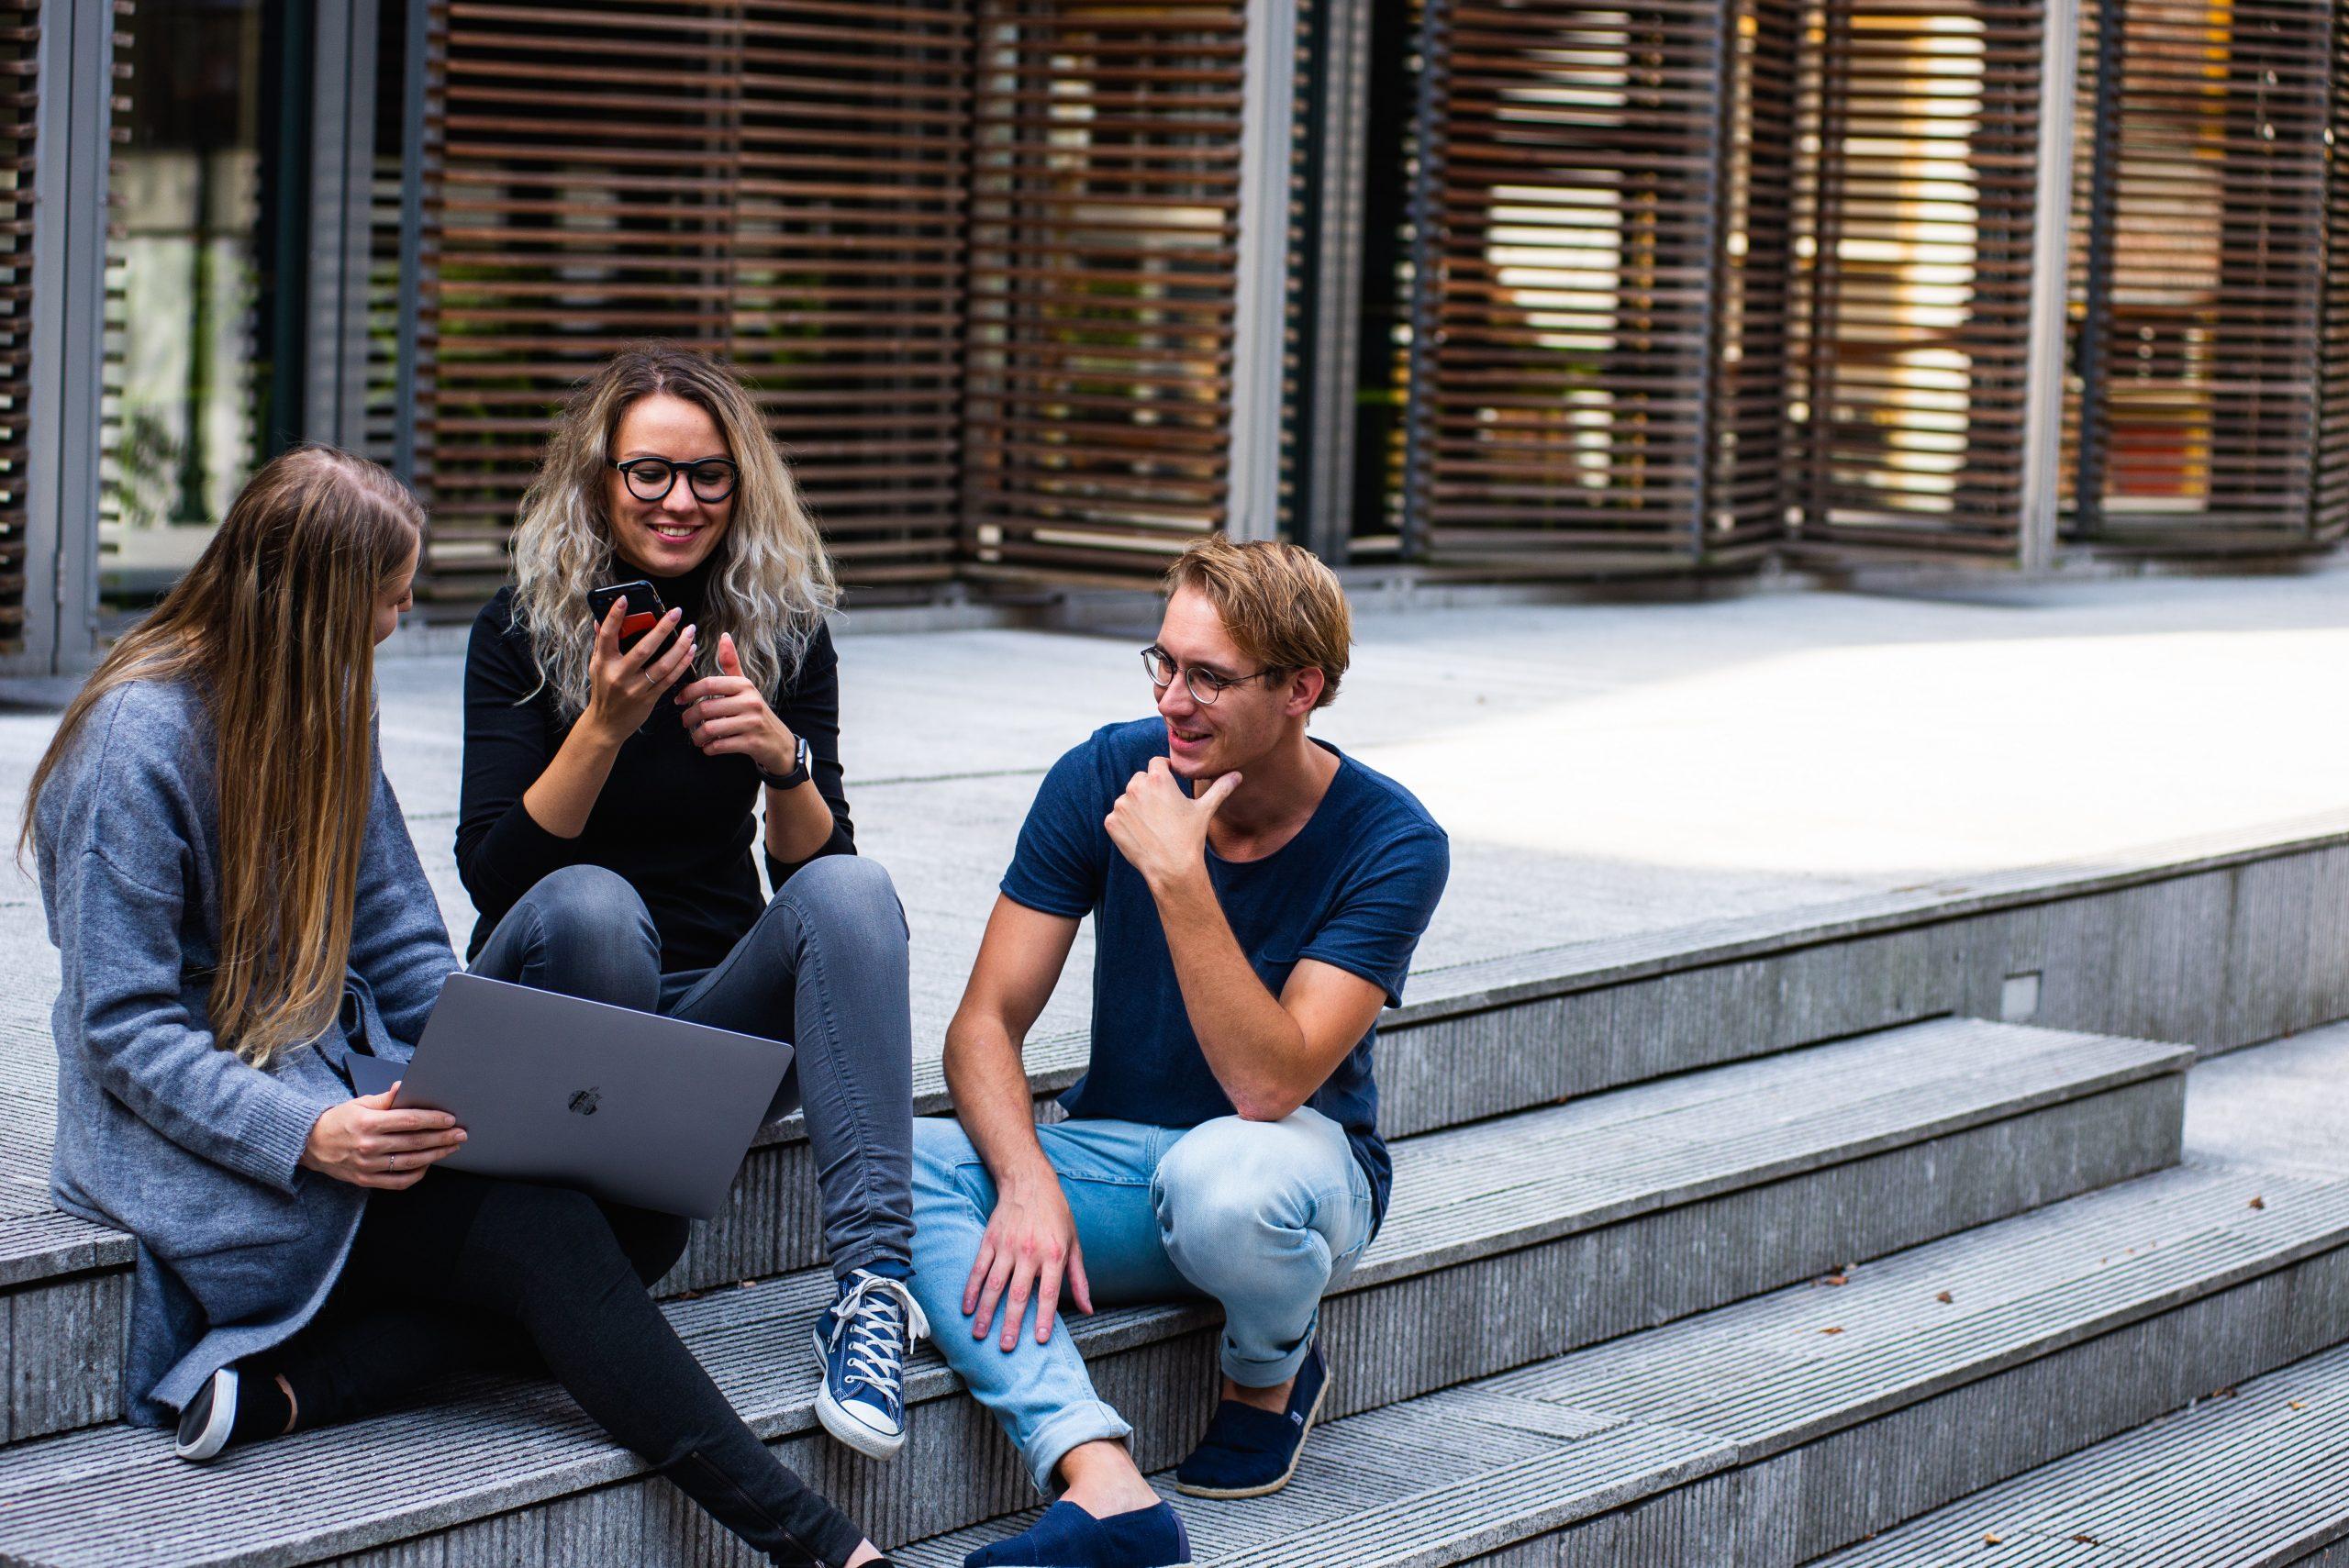 Профессор ВШЭ заявил об оттоке талантливой молодежи за рубеж